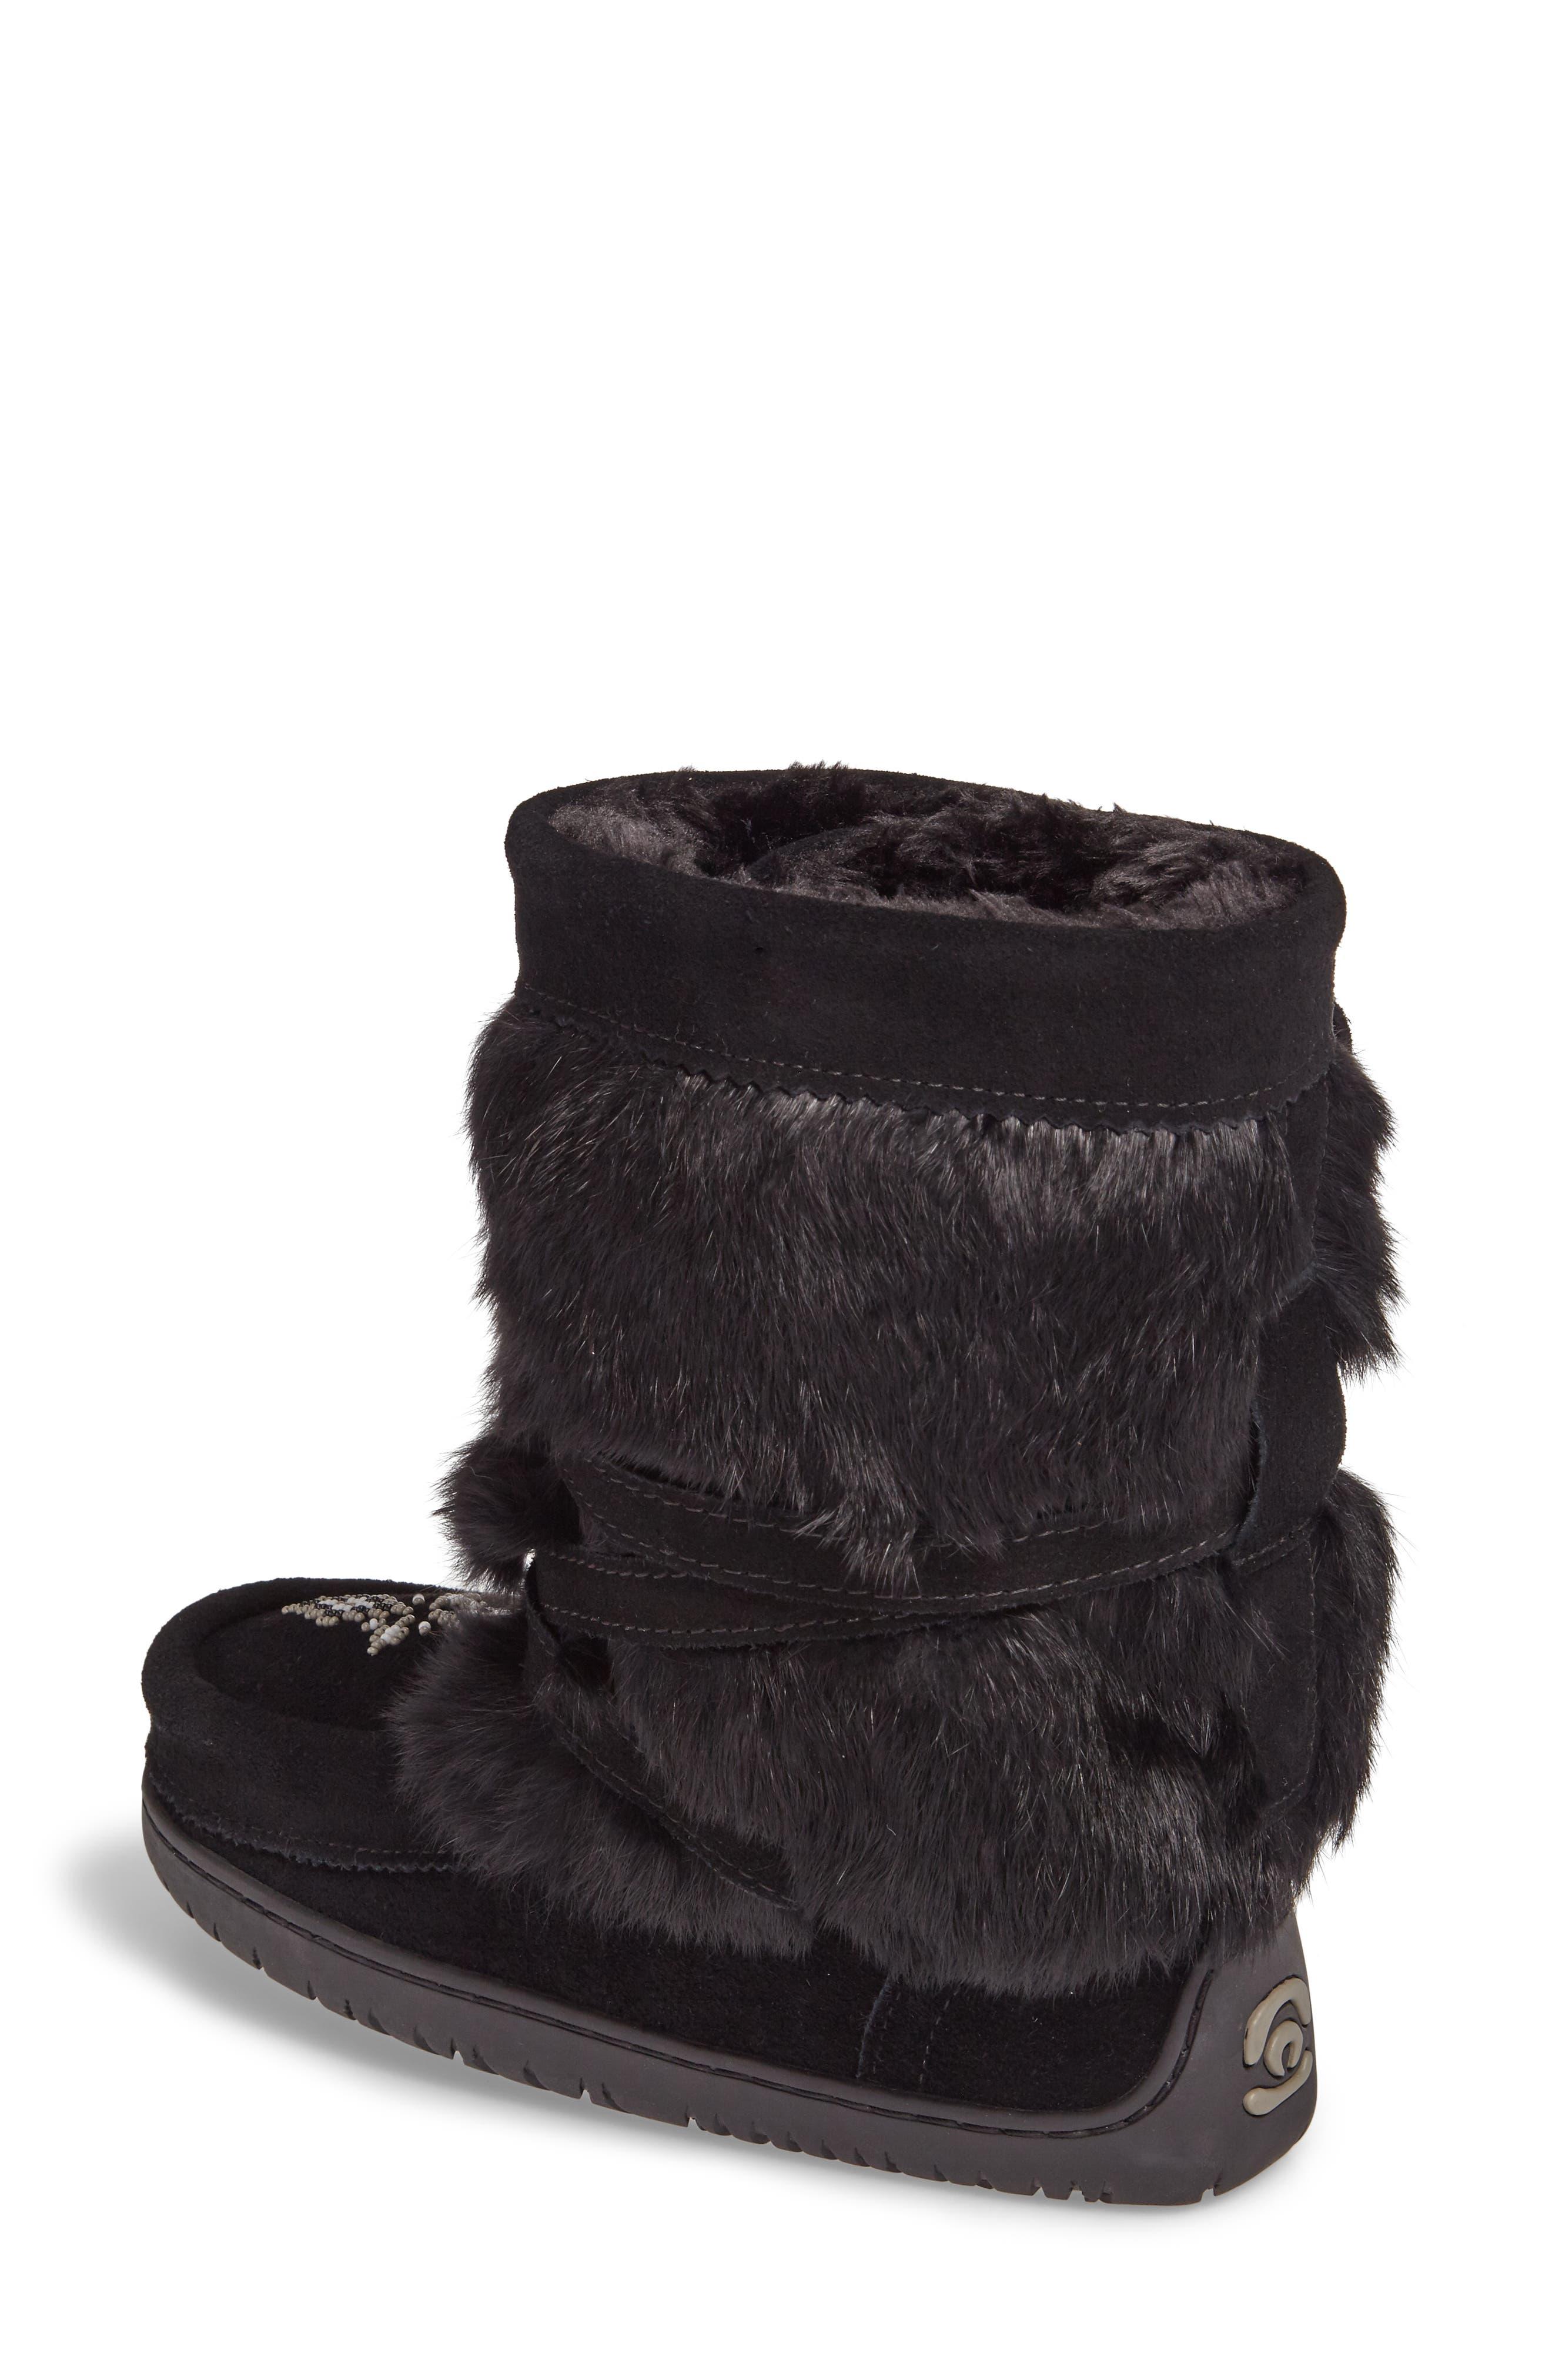 Beaded Short Wrap Genuine Rabbit Fur & Shearling Boot,                             Alternate thumbnail 2, color,                             Black Rabbit Fur